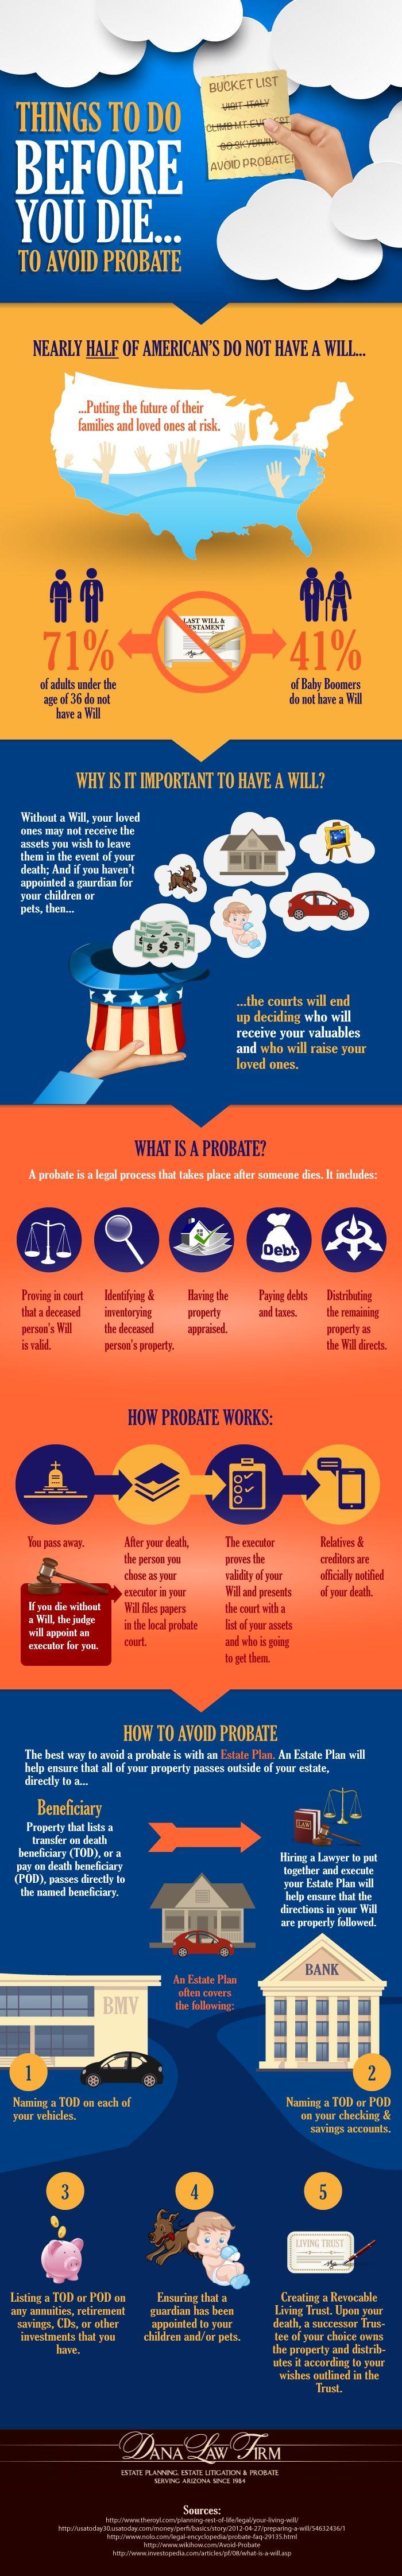 how to avoid probate in saskatchewan